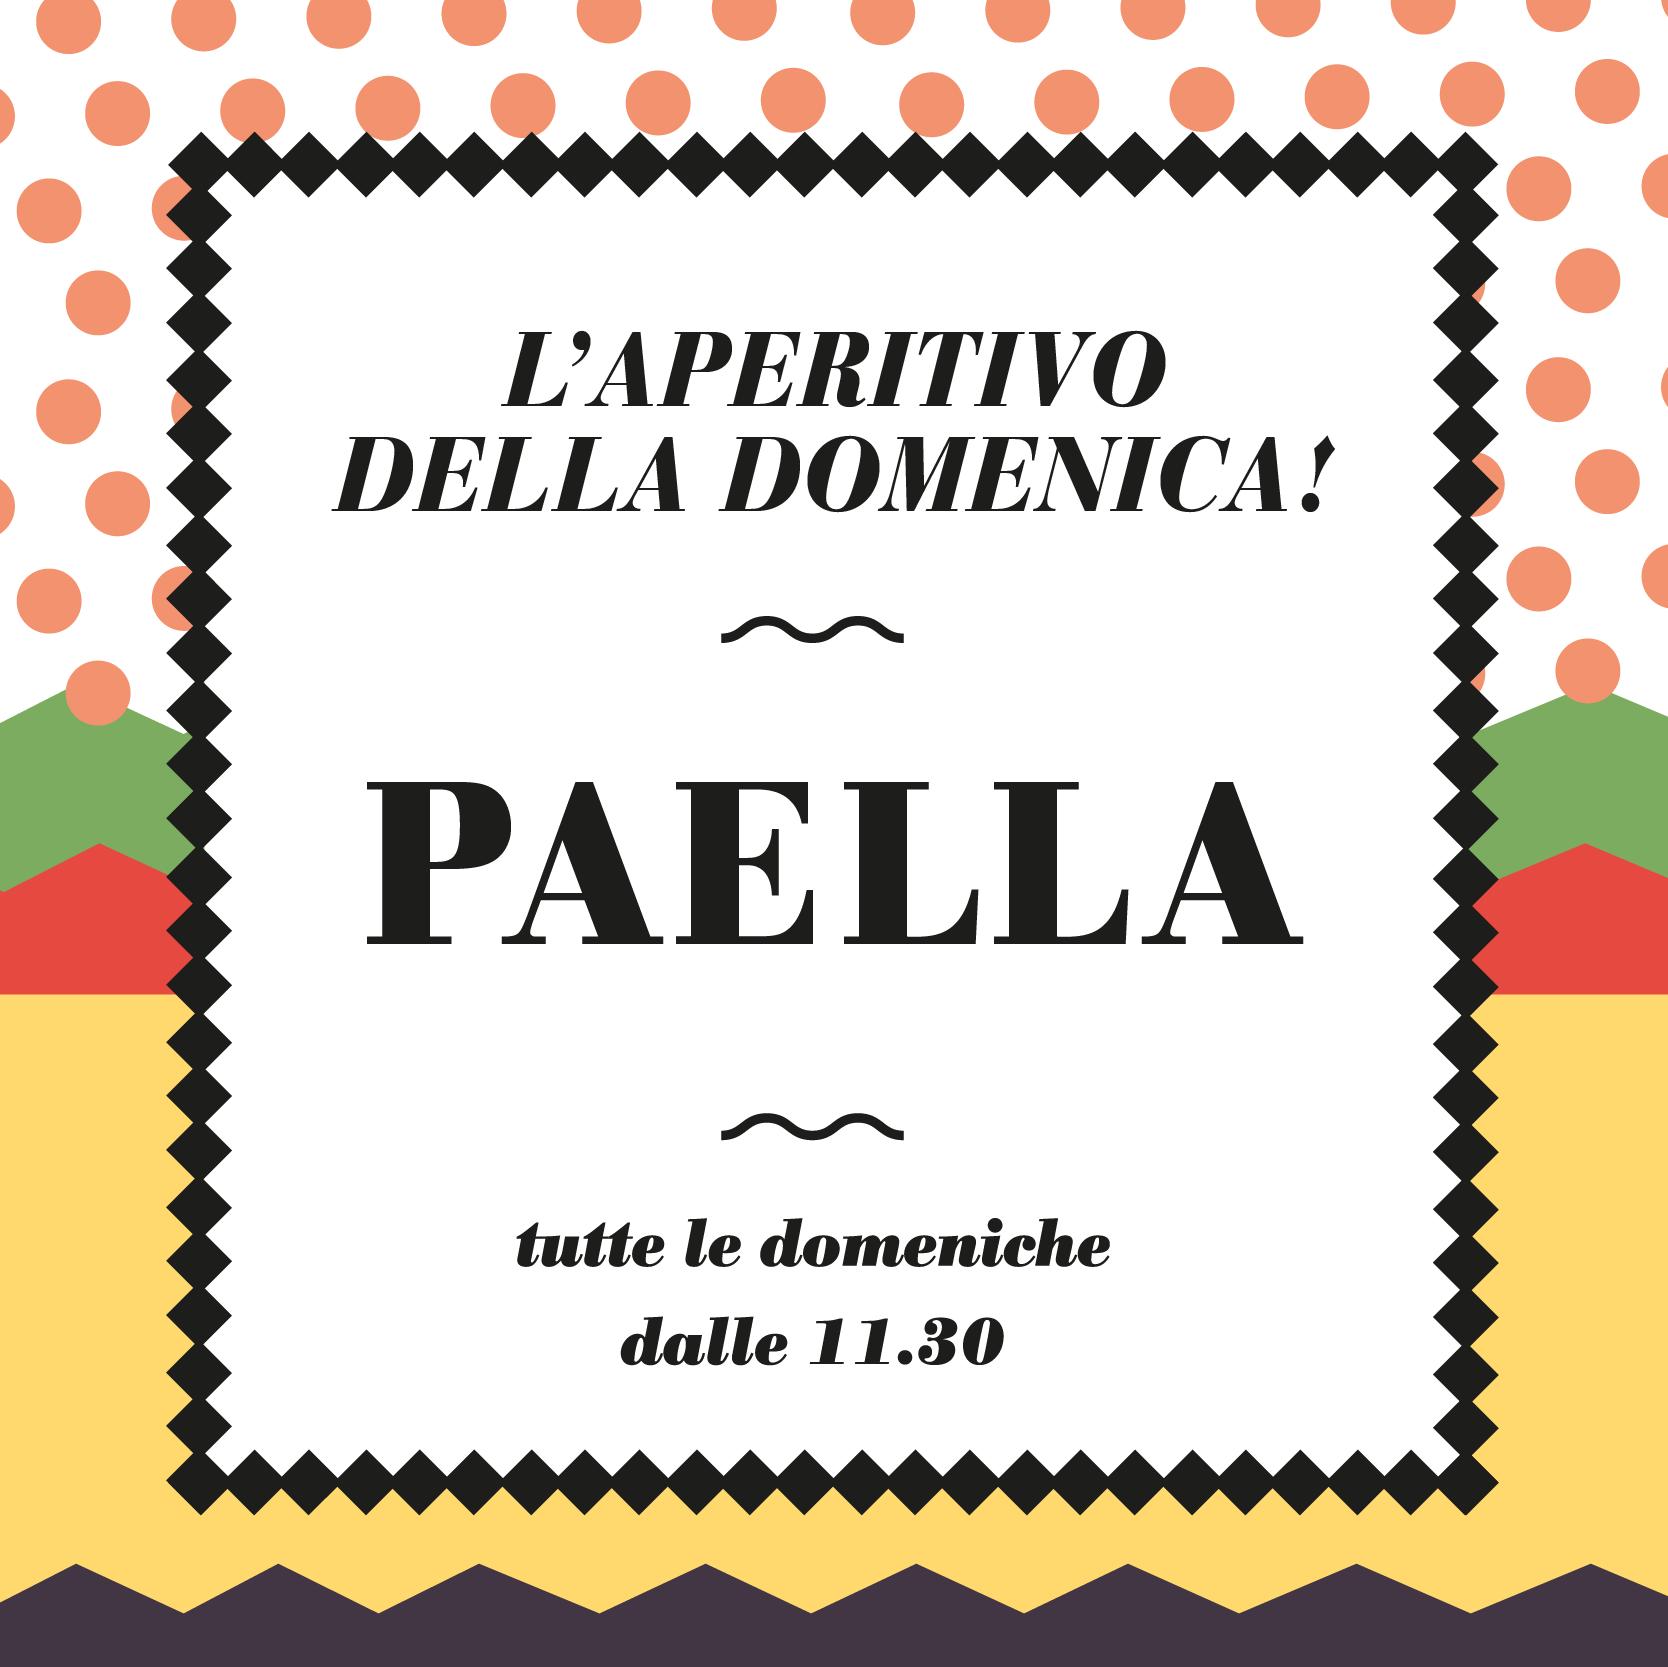 Paella_Social-01